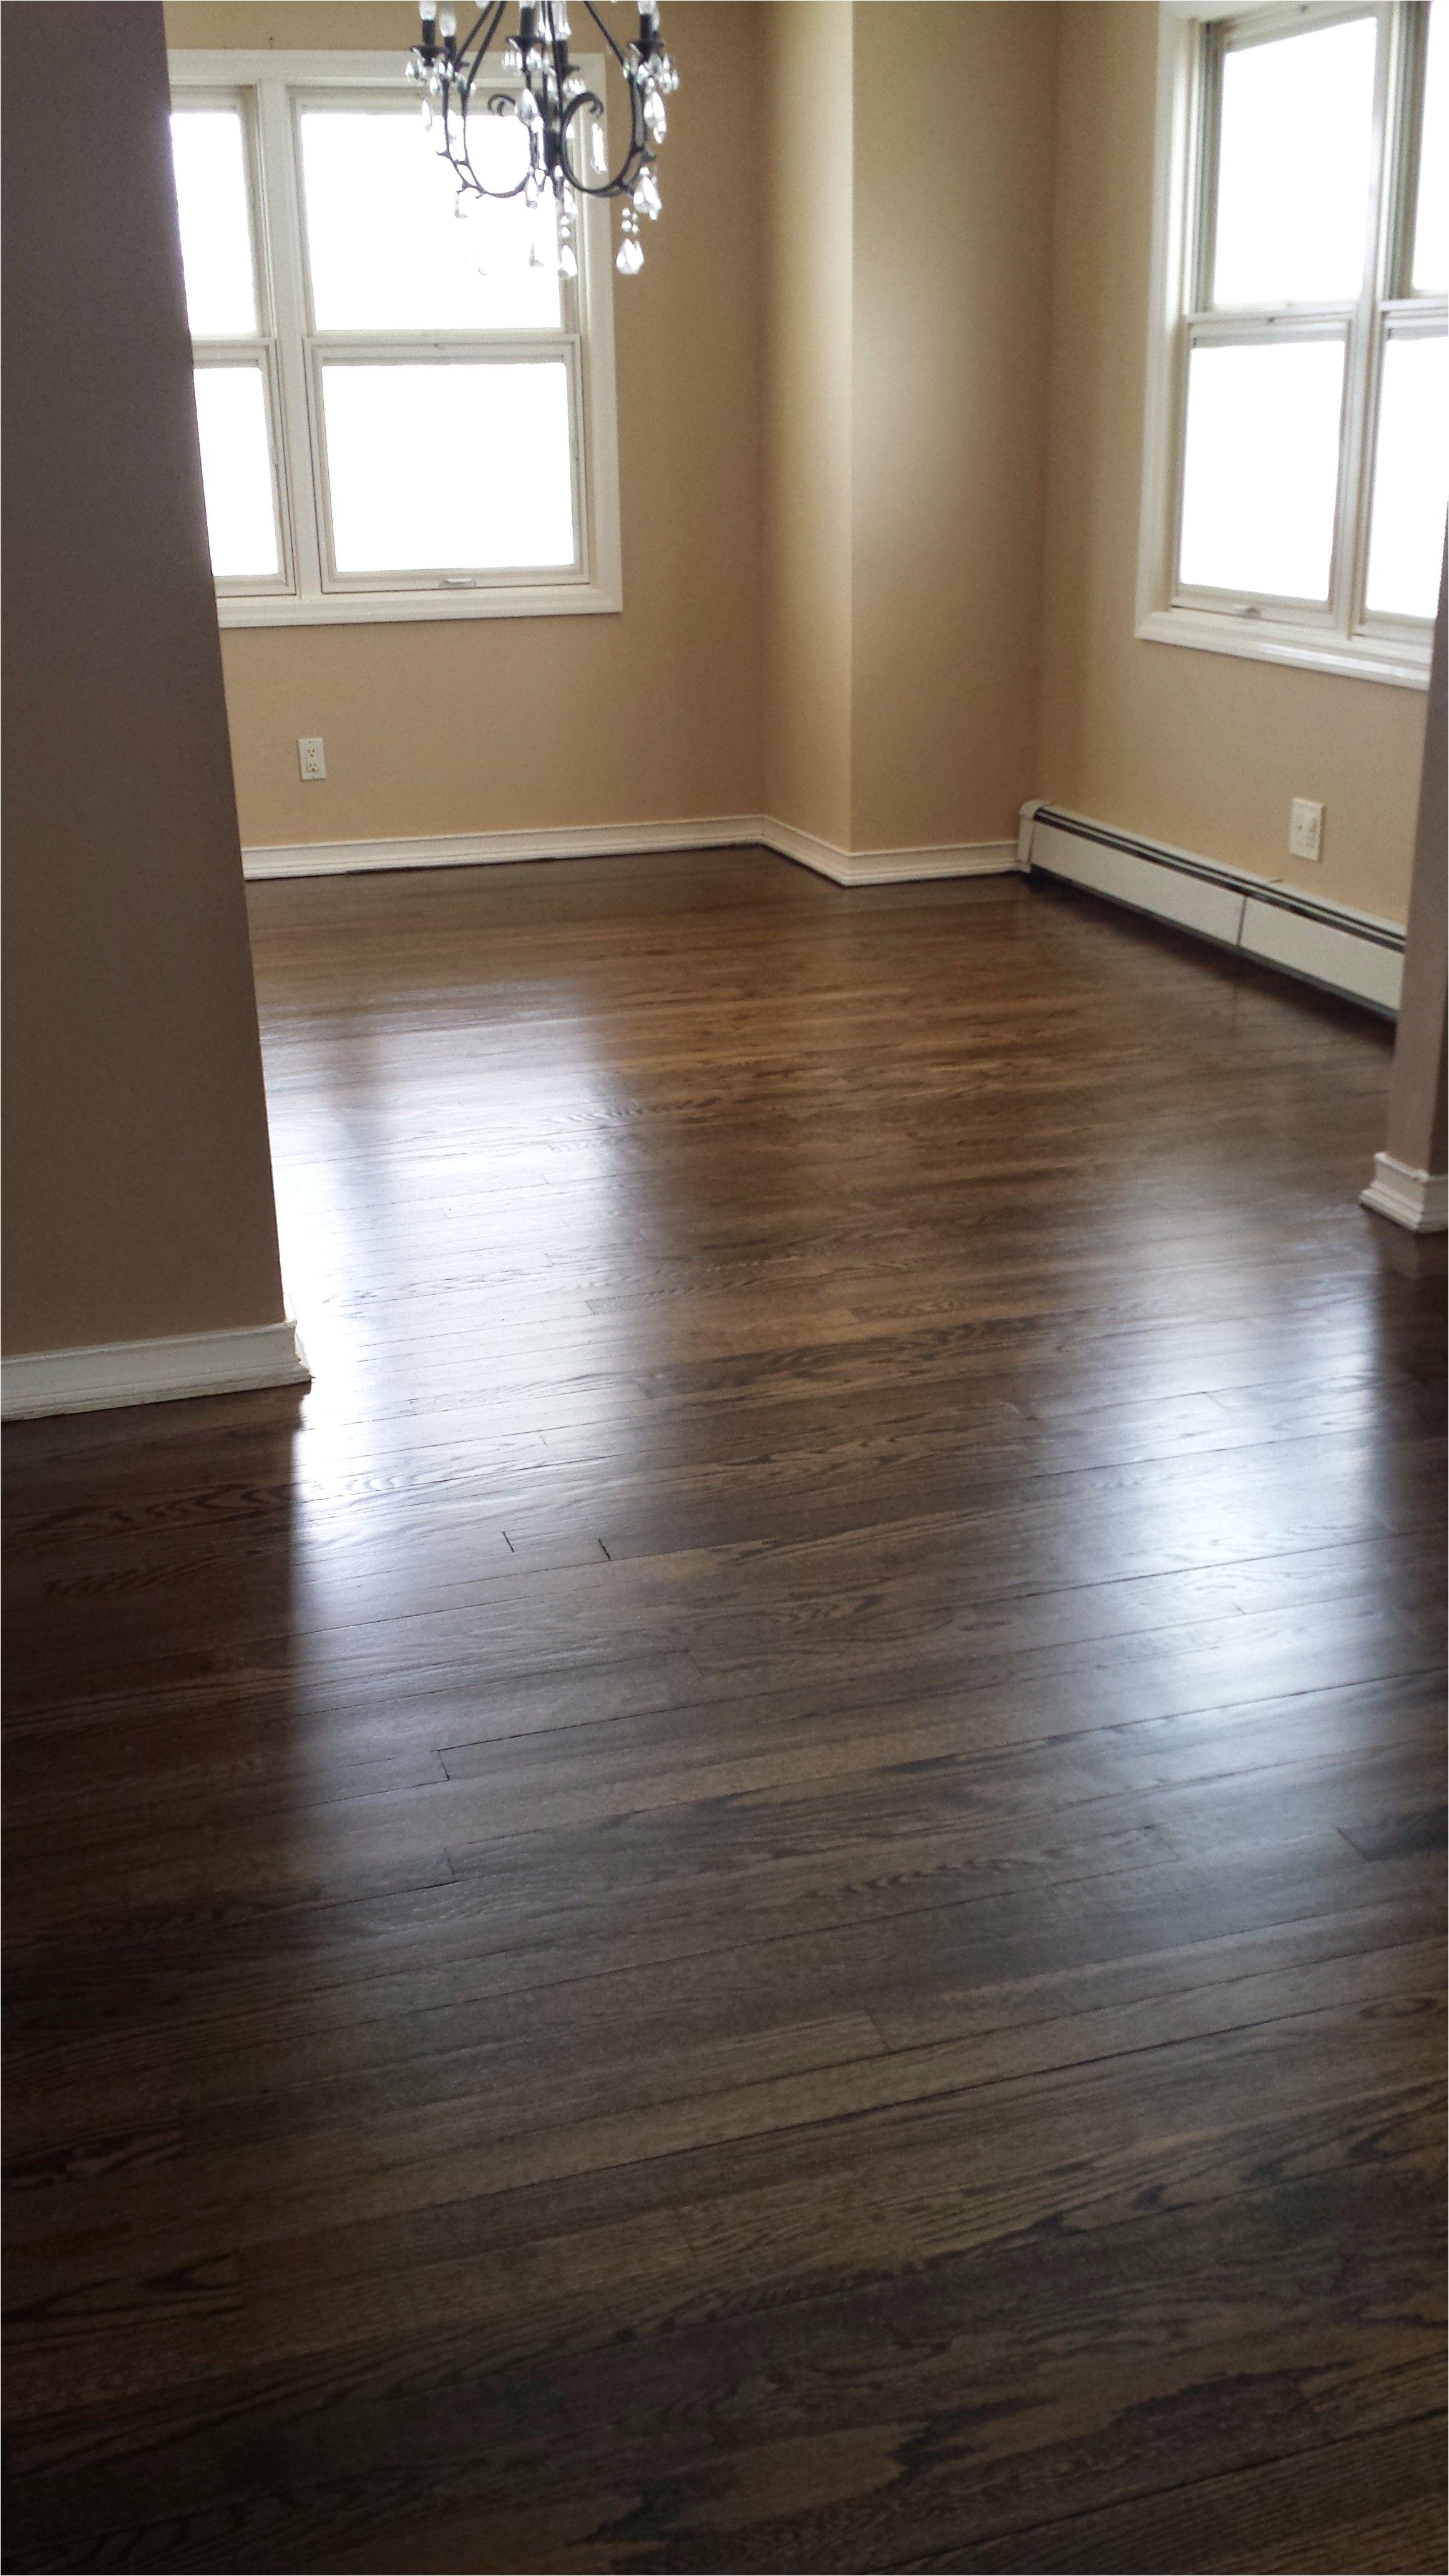 interior amusing refinishingod floors diy network refinish parquet without sanding buffing with pet stains refinishing hardwood